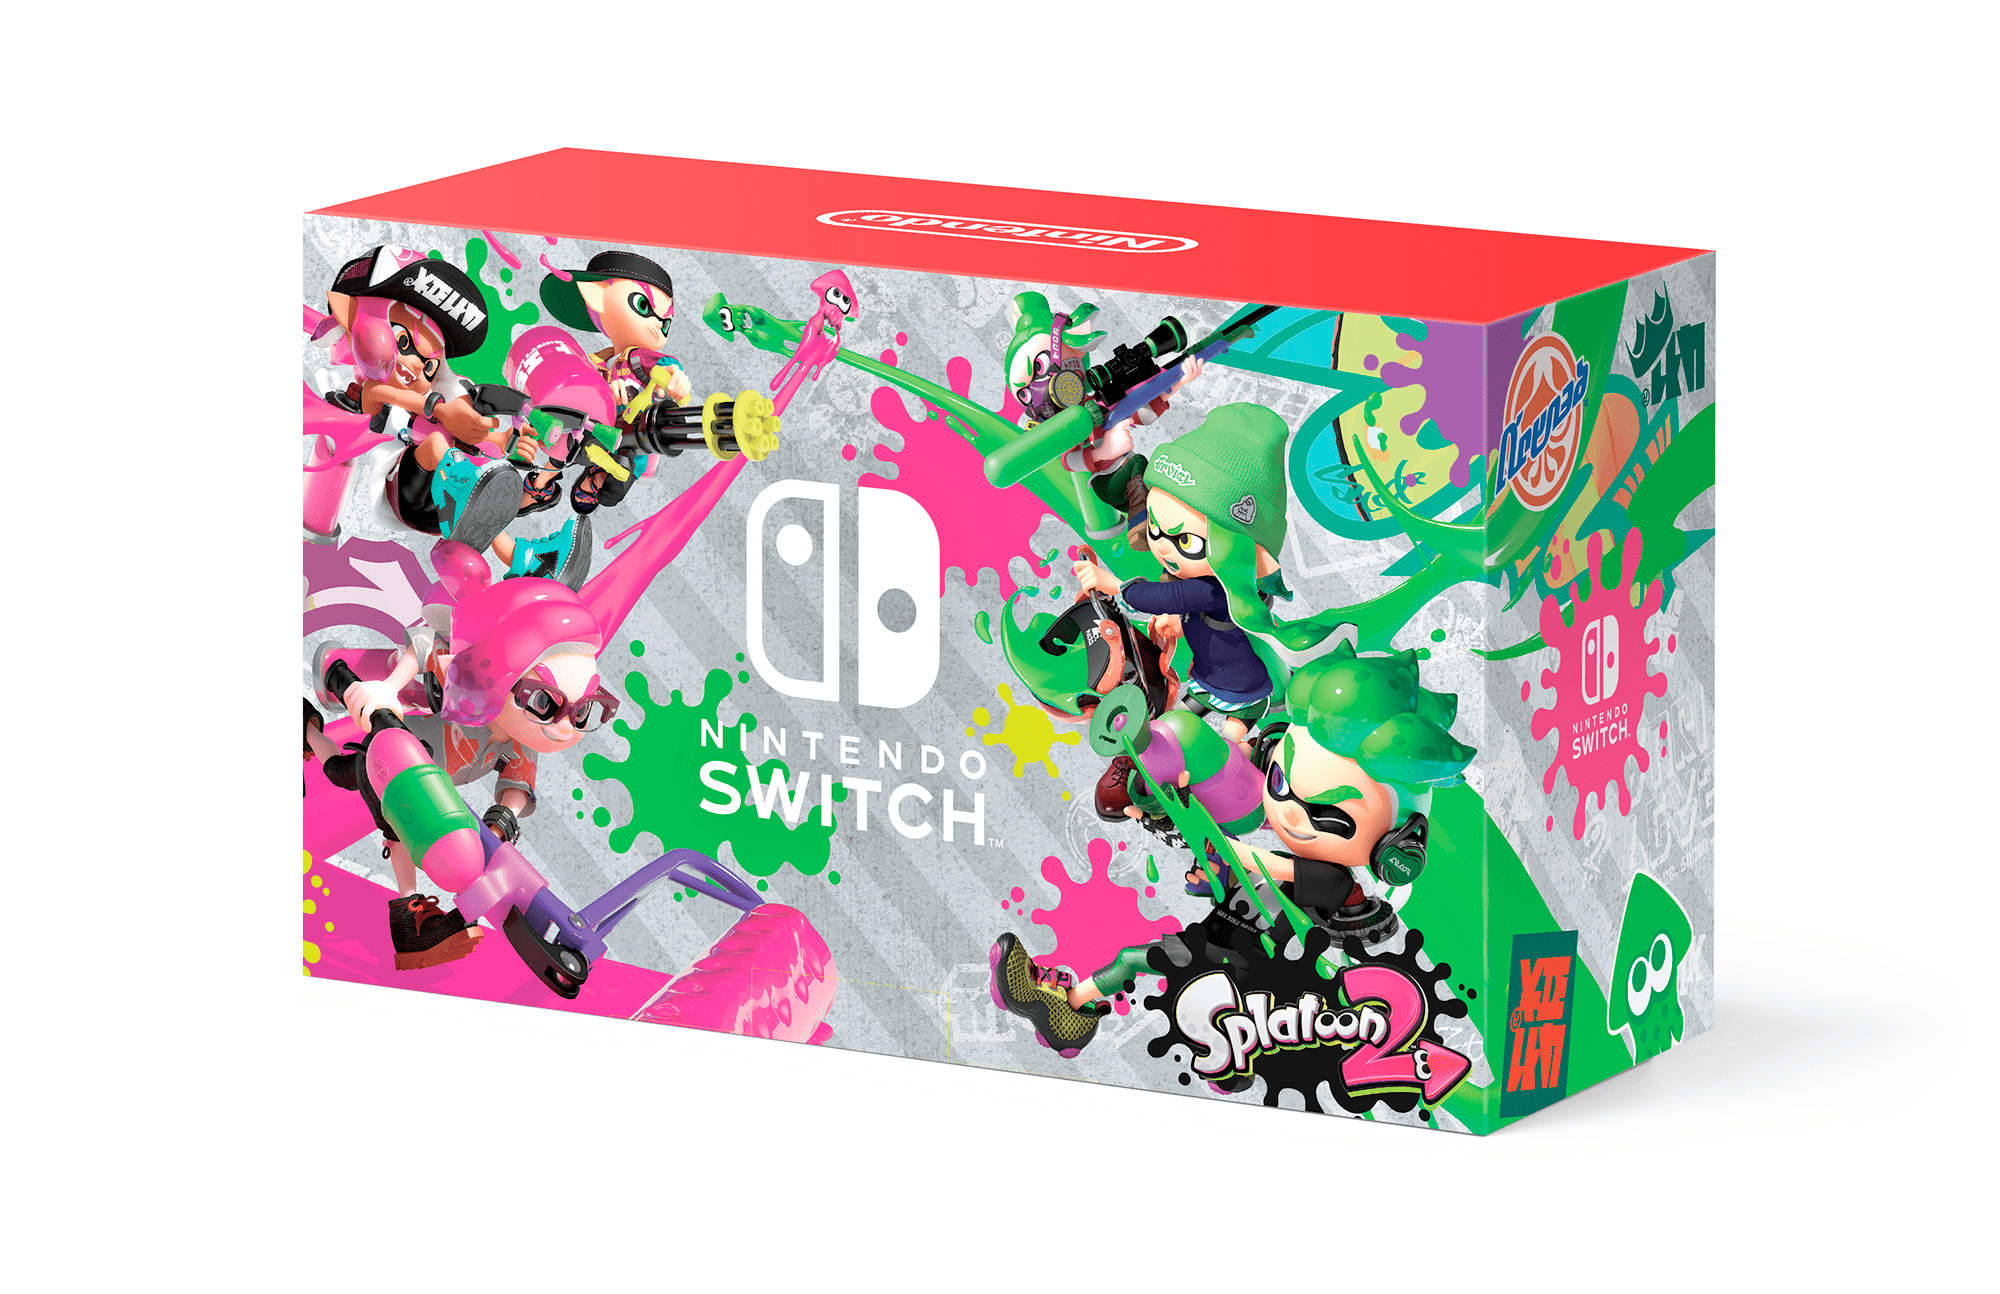 Nintendo Switch Edición Especial